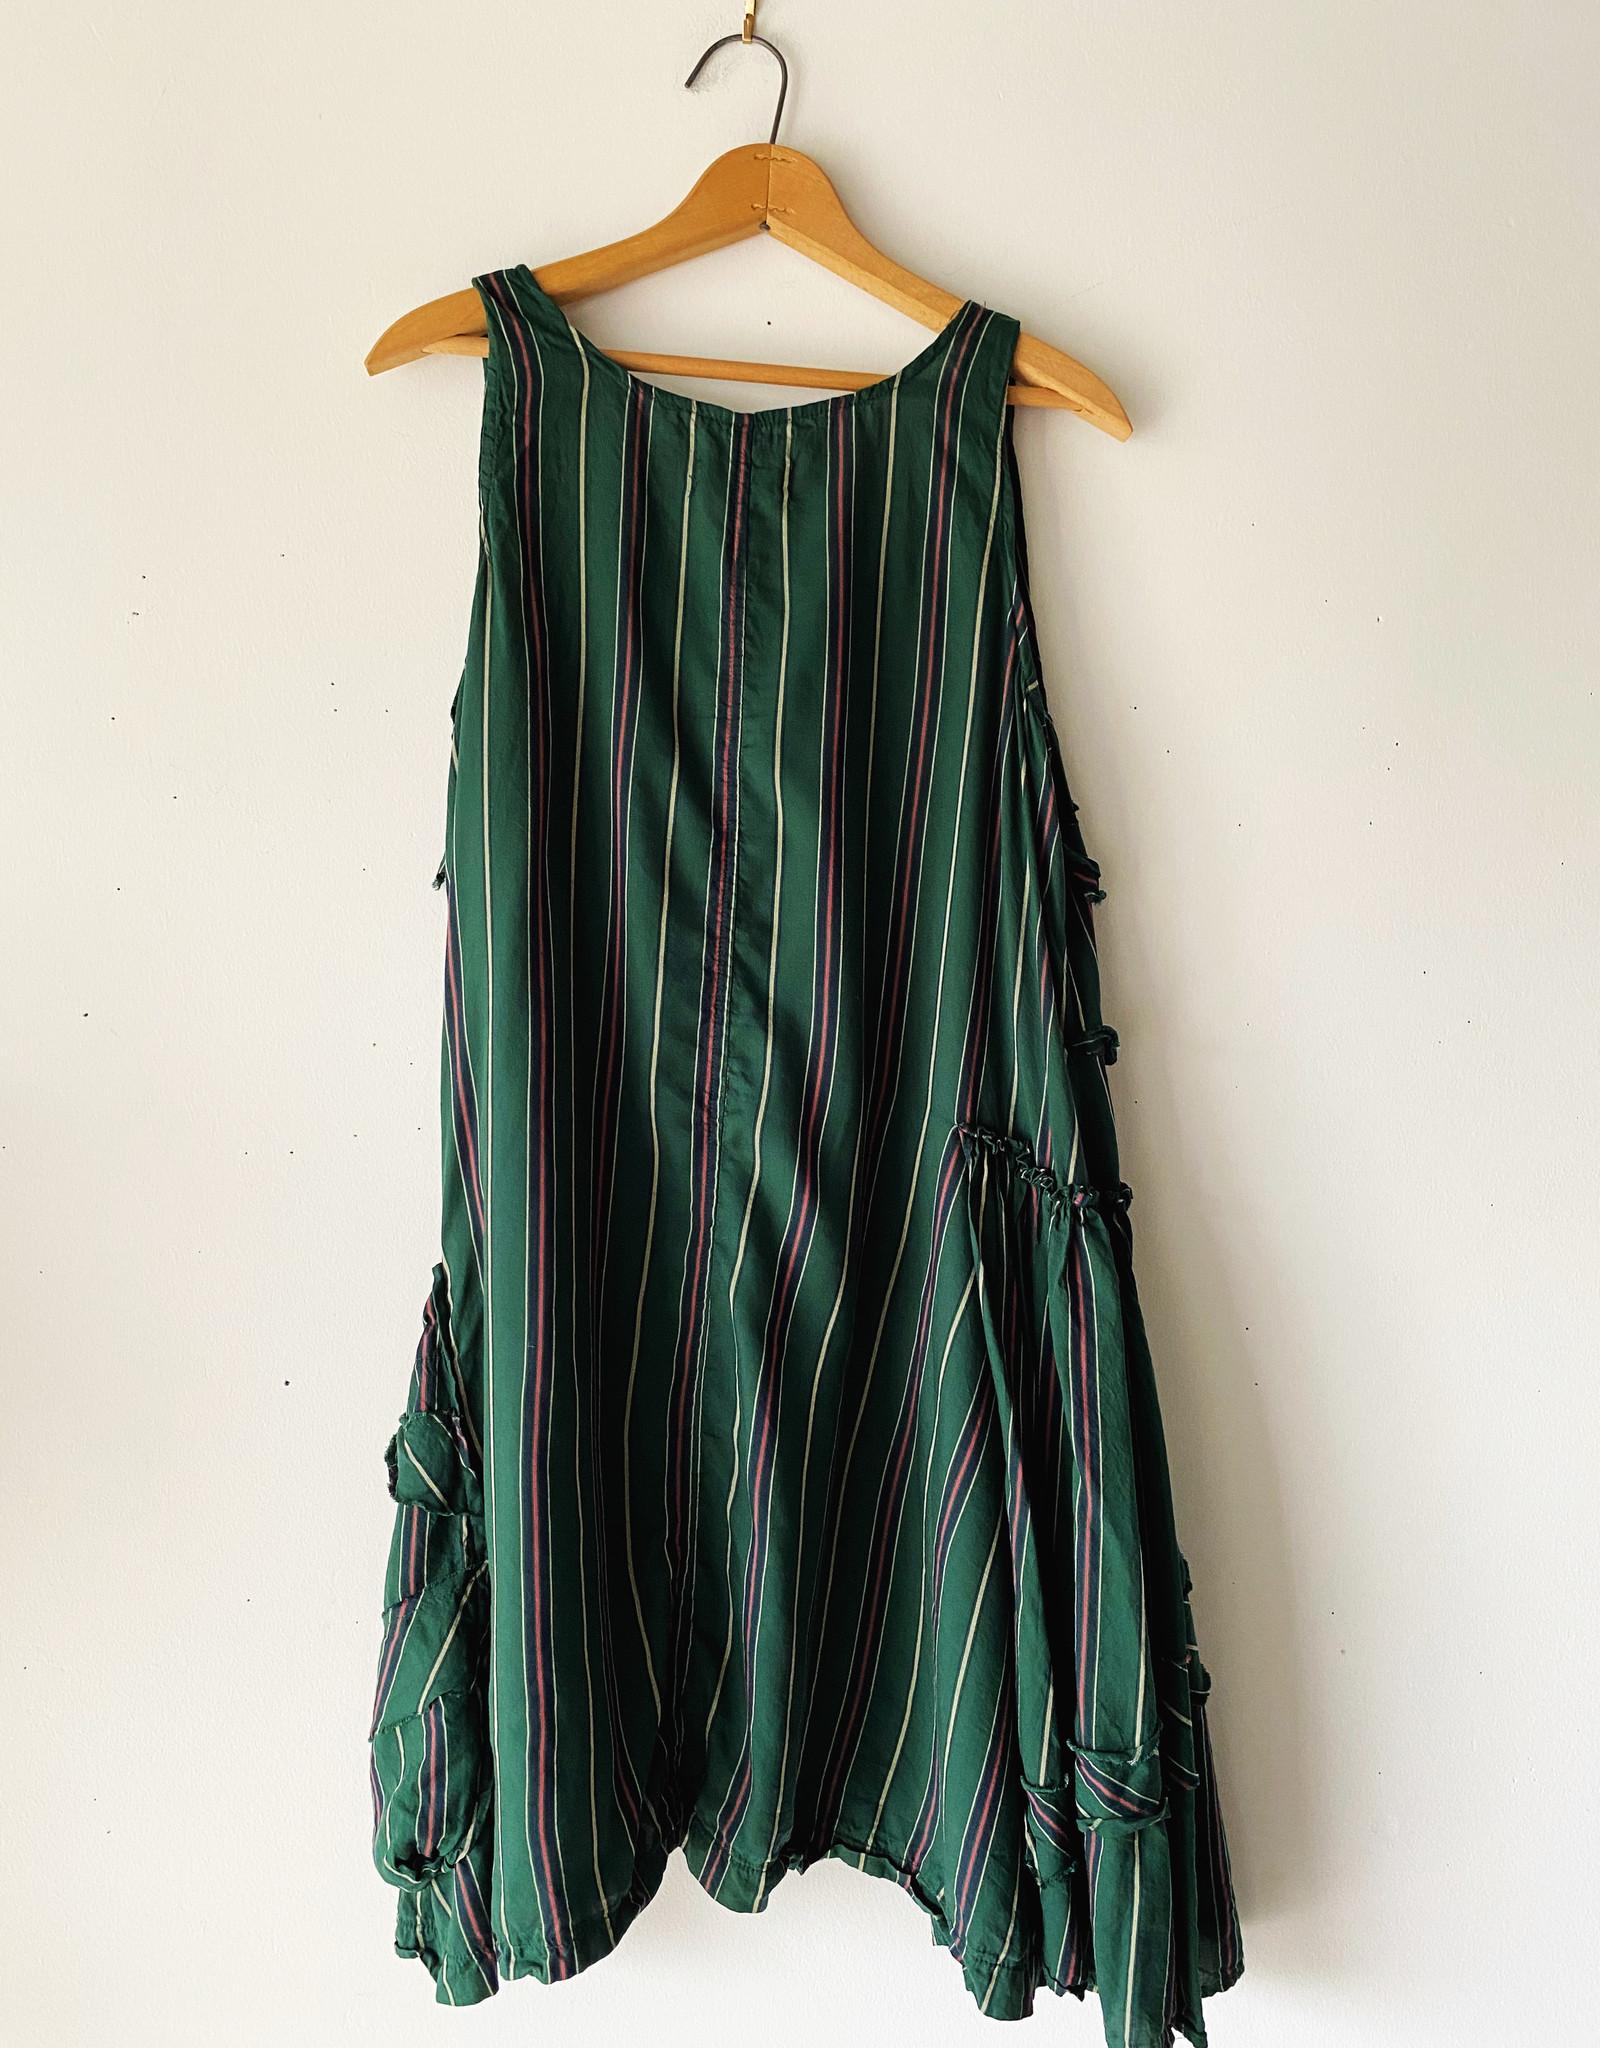 BODIL FY2082 BODIL SHORT TANK DRESS